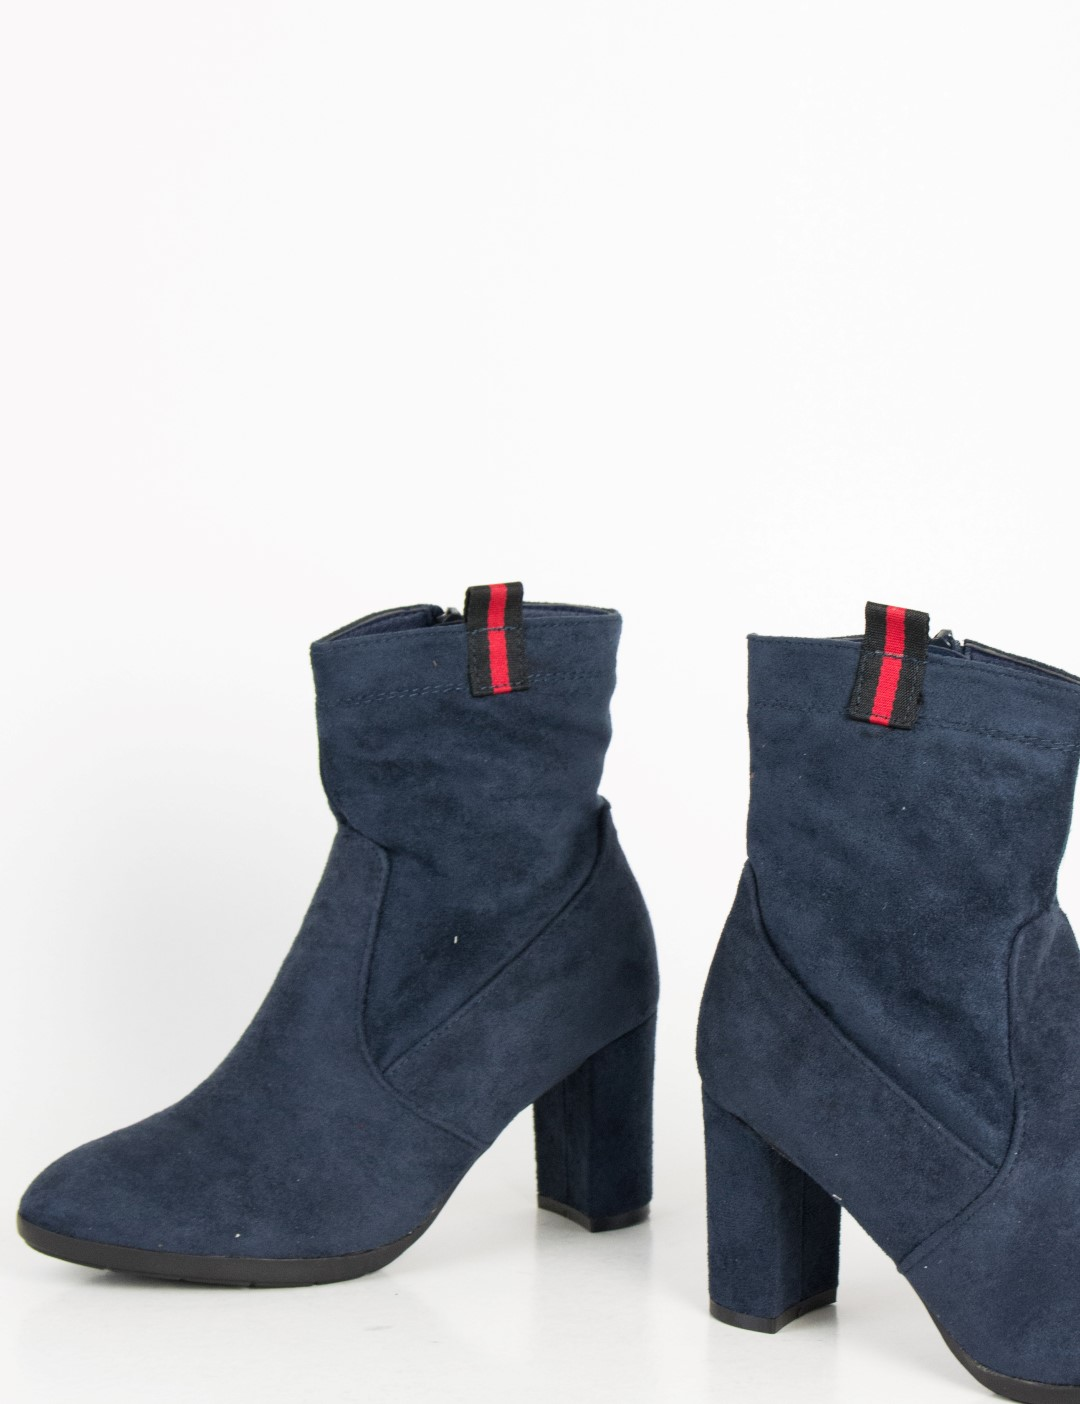 0a8025773ac Γυναικεία Παπούτσια, Γυναικεία Μποτάκια, Μποτάκια Χωρίς Τακούνι